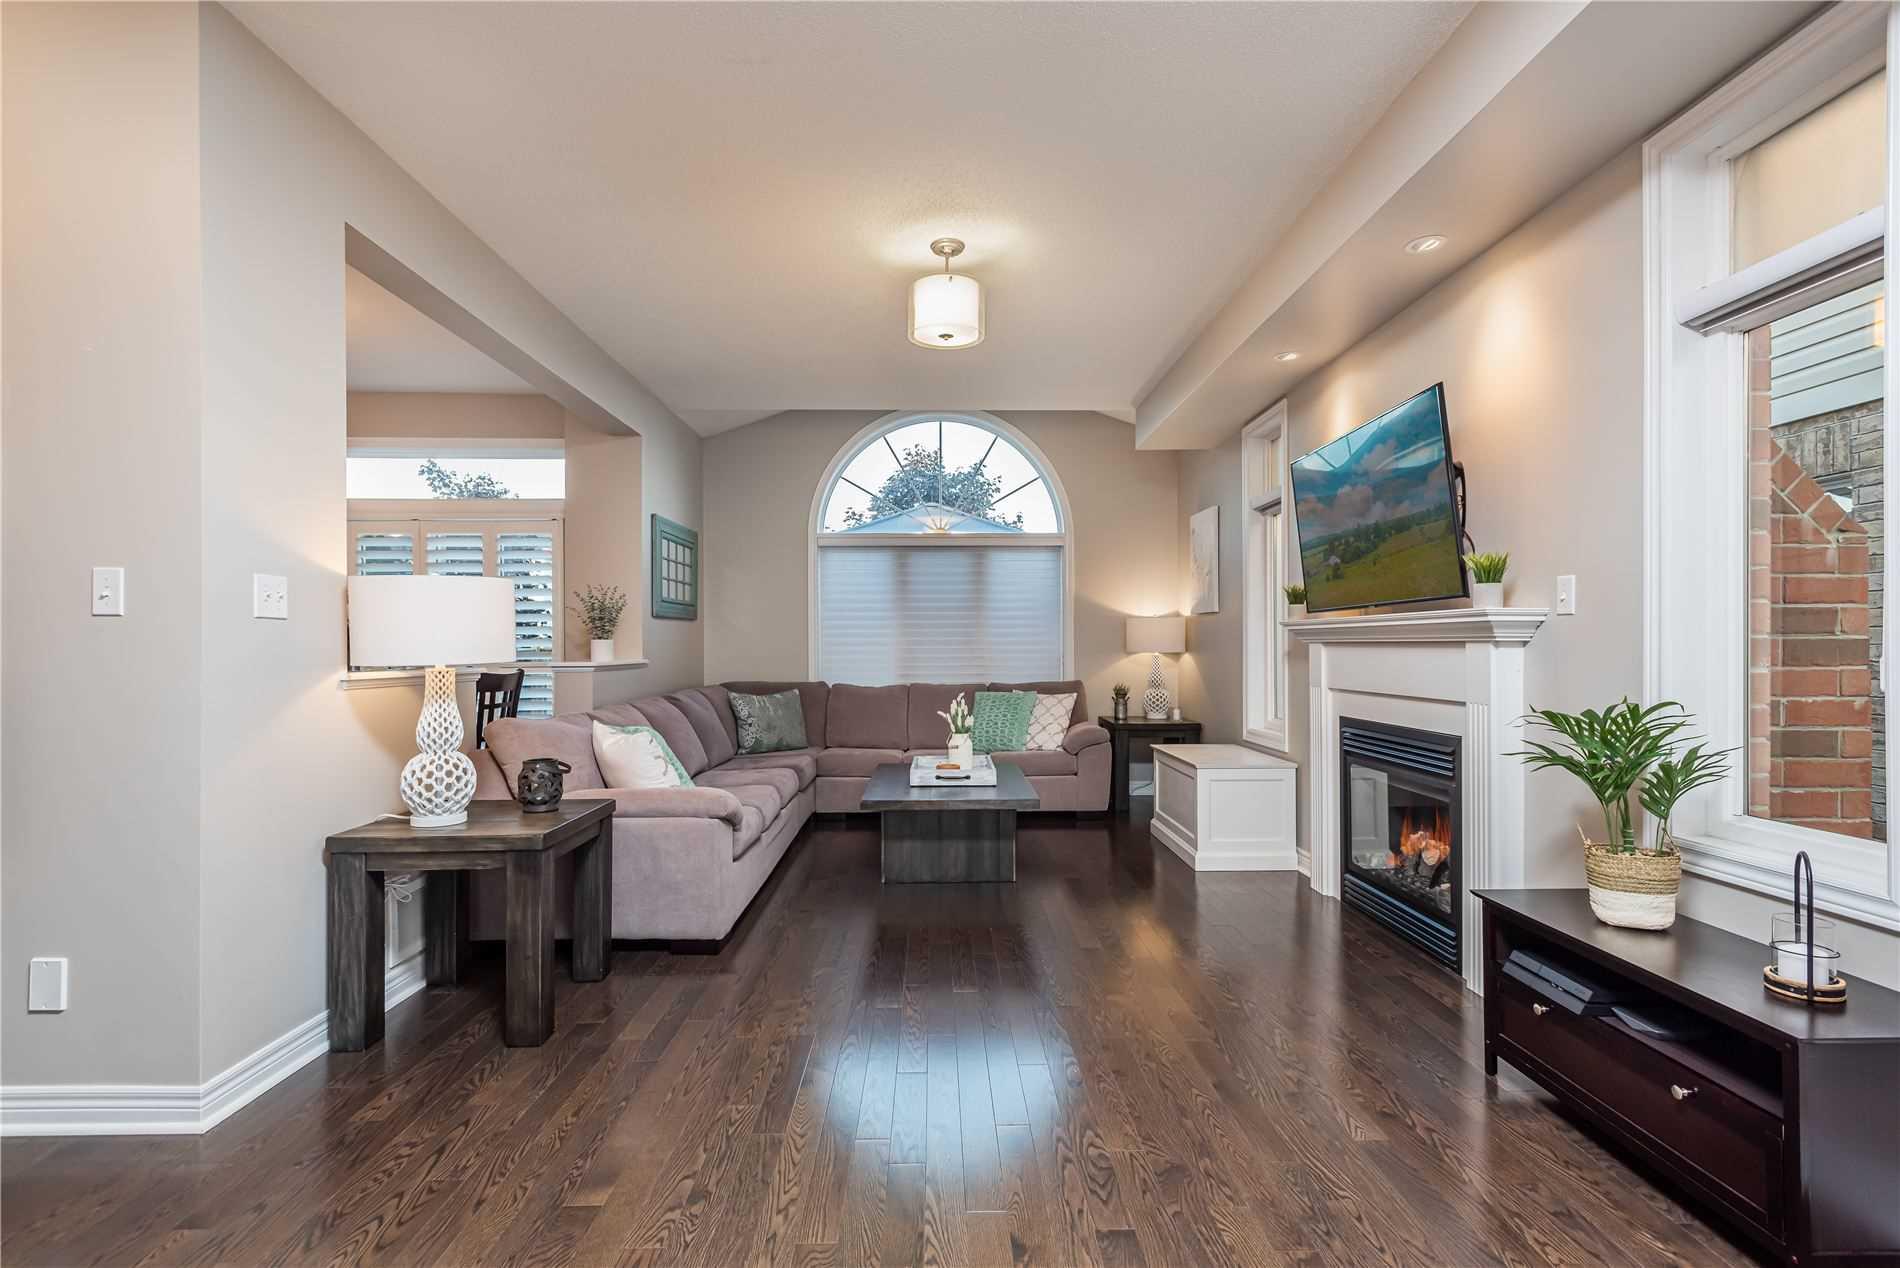 Detached house For Sale In Clarington - 15 Goodall Cres, Clarington, Ontario, Canada L1C0G2 , 3 Bedrooms Bedrooms, ,3 BathroomsBathrooms,Detached,For Sale,Goodall